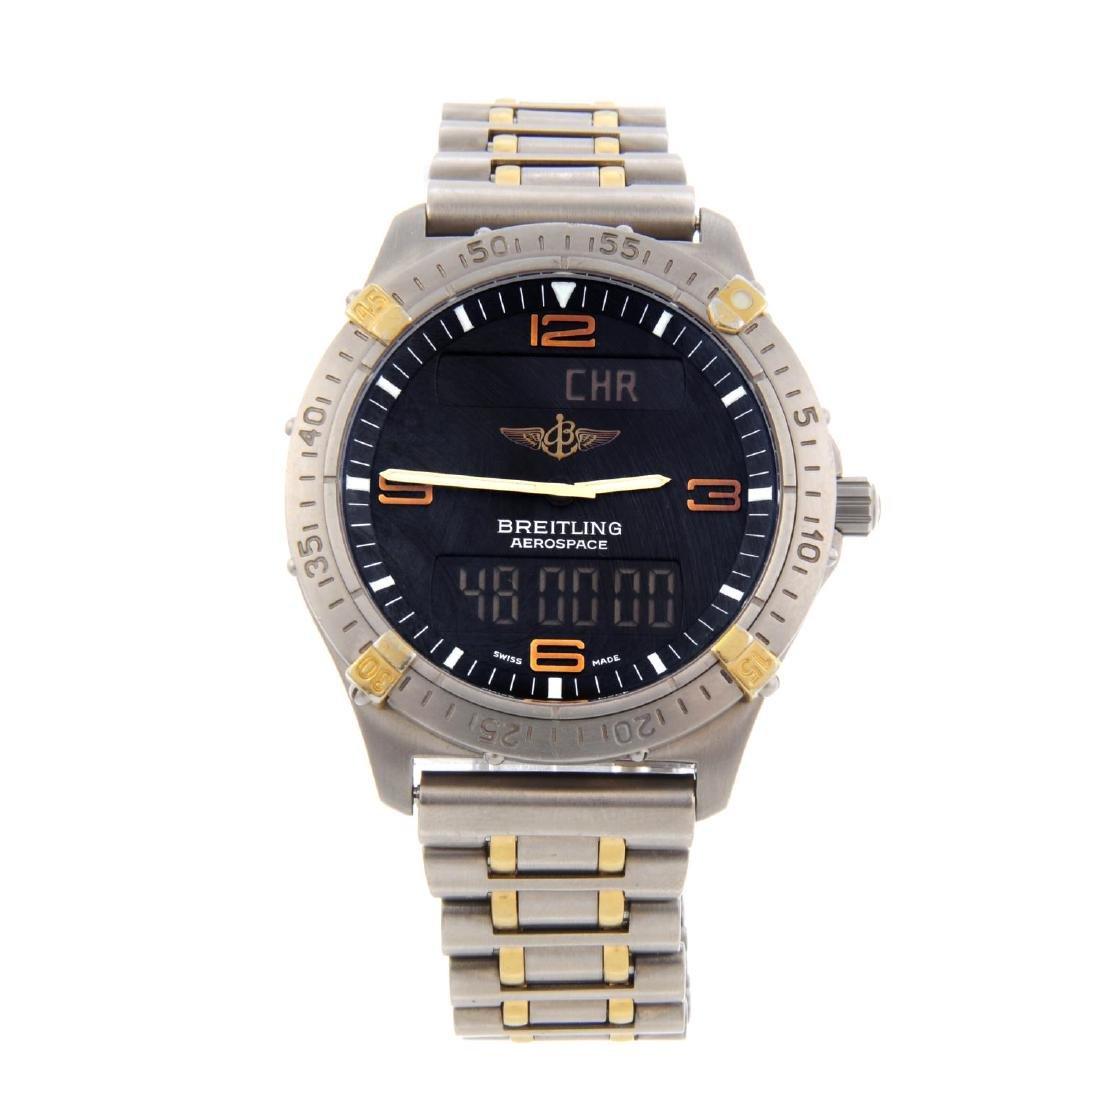 BREITLING - a gentleman's Aerospace chronograph